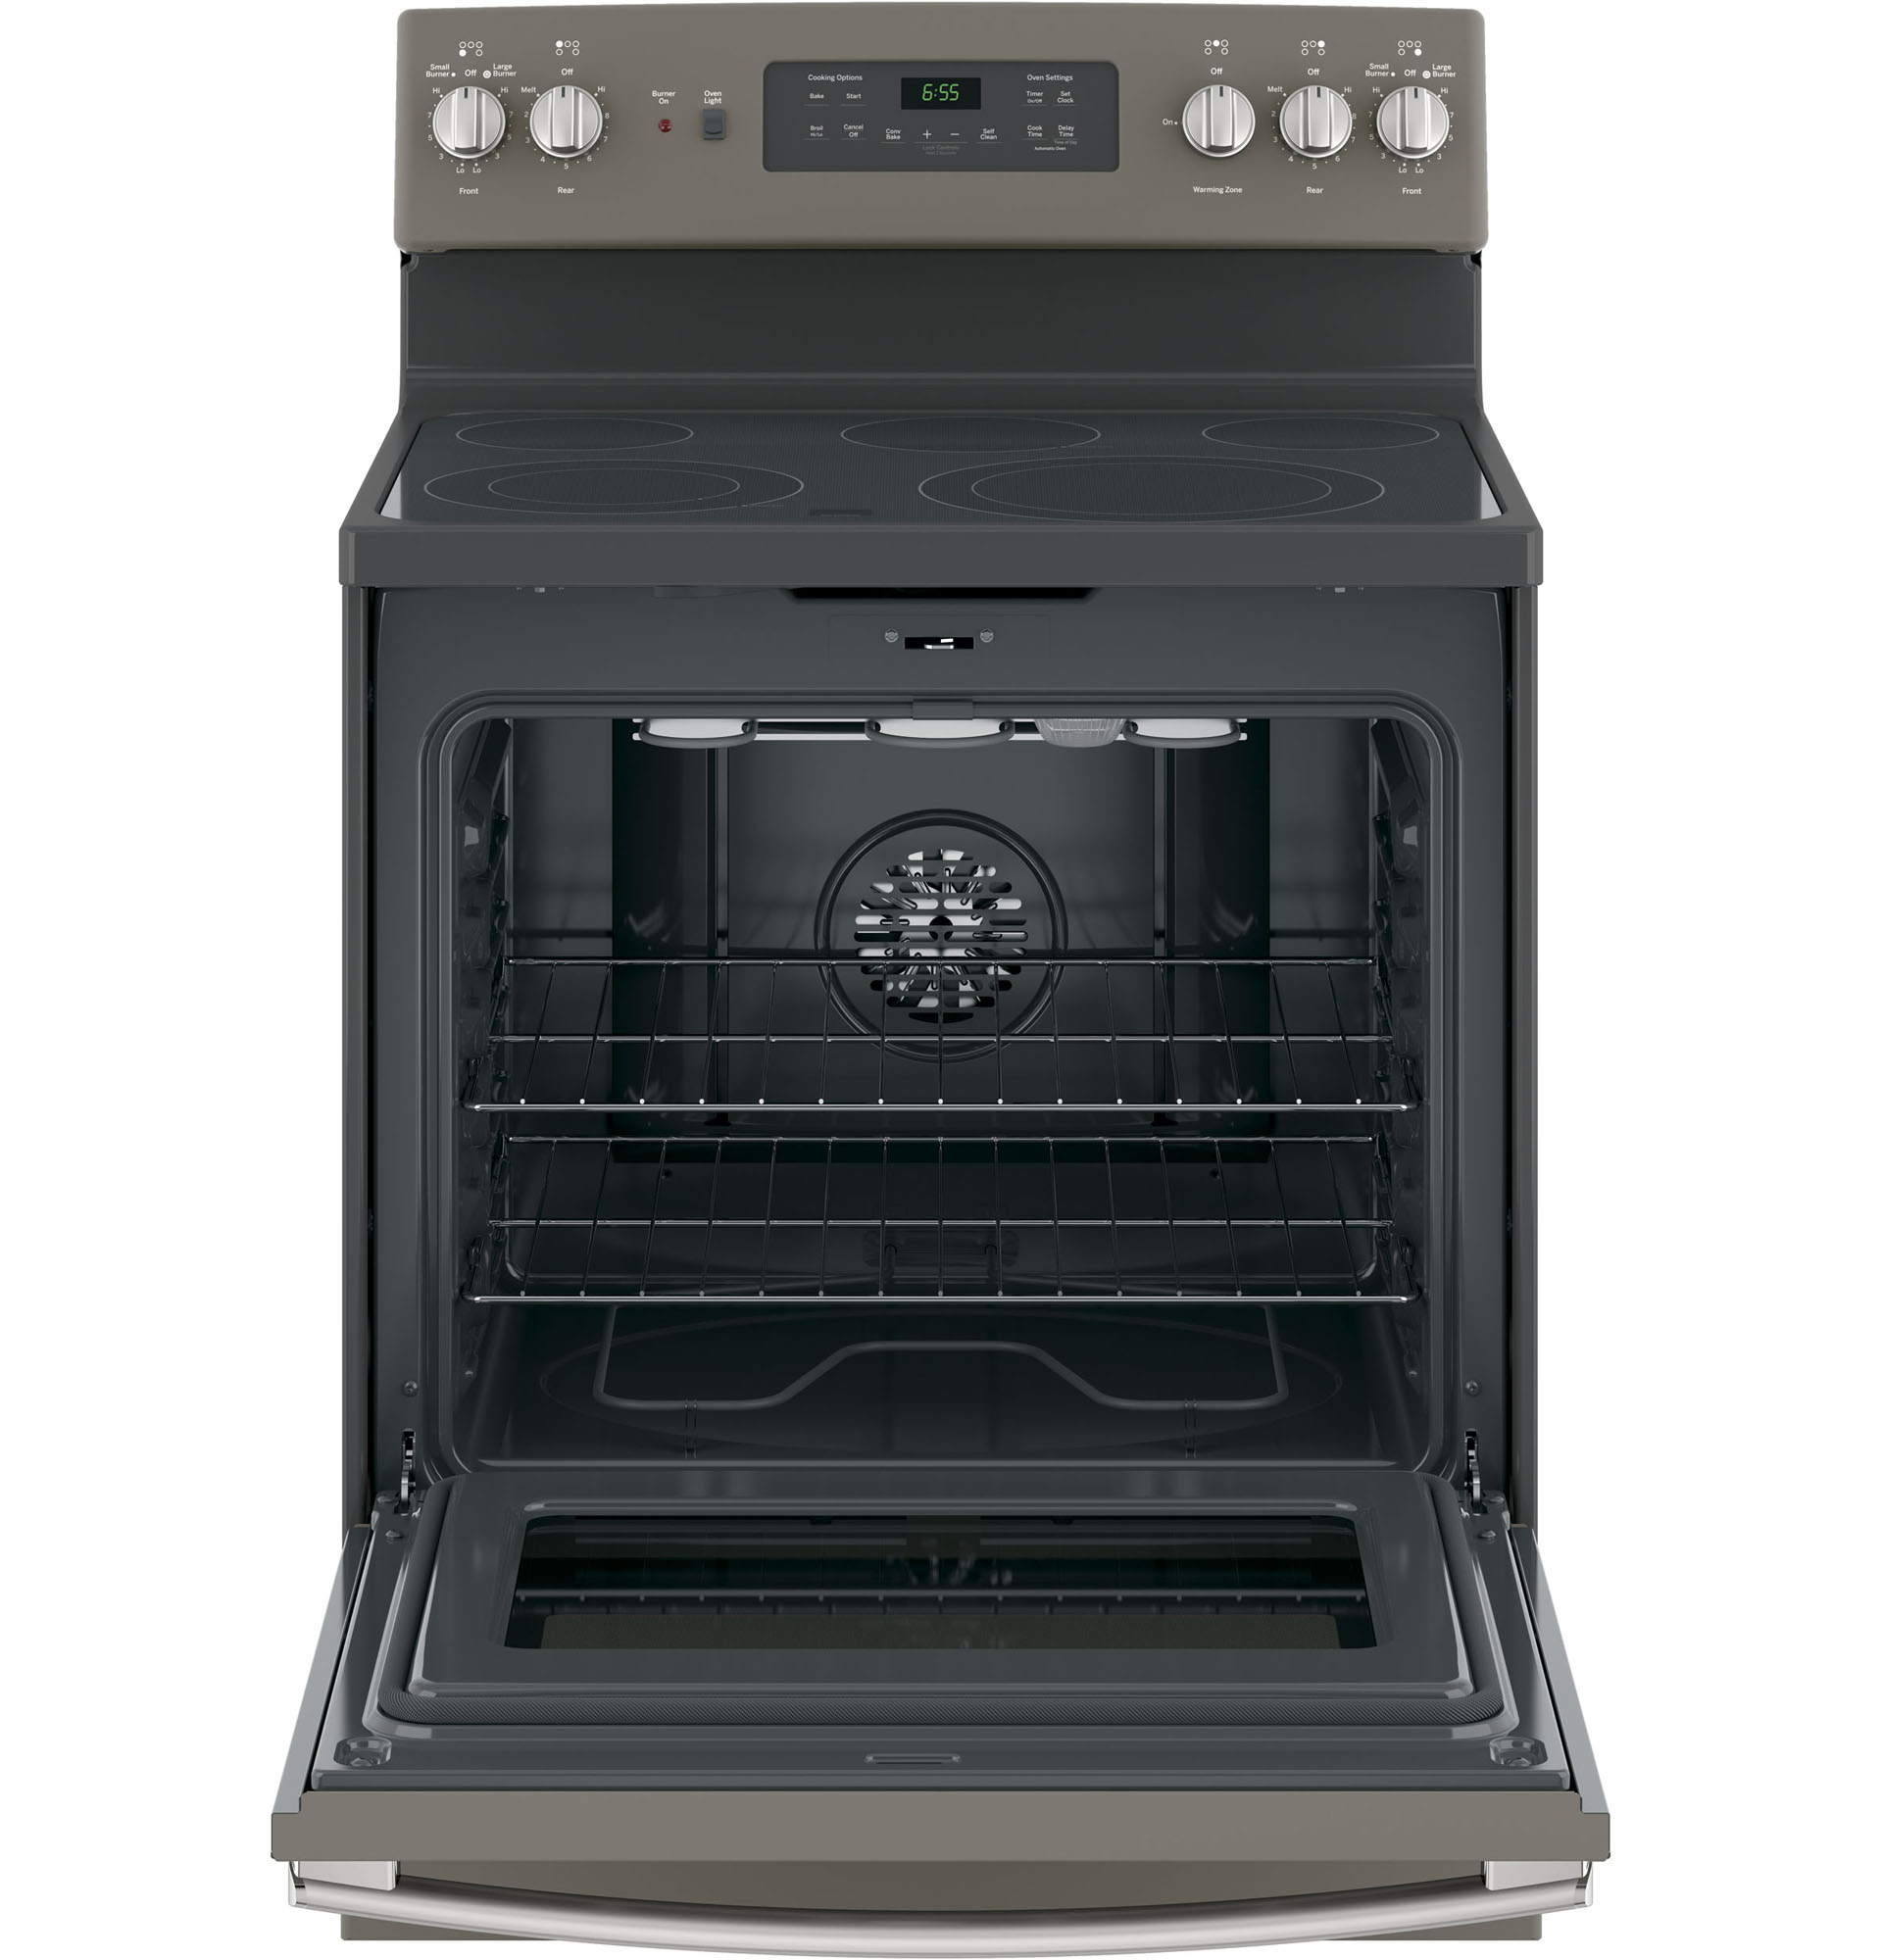 "GE Appliances JB655EKES 30"" Freestanding Electric Range - Slate"